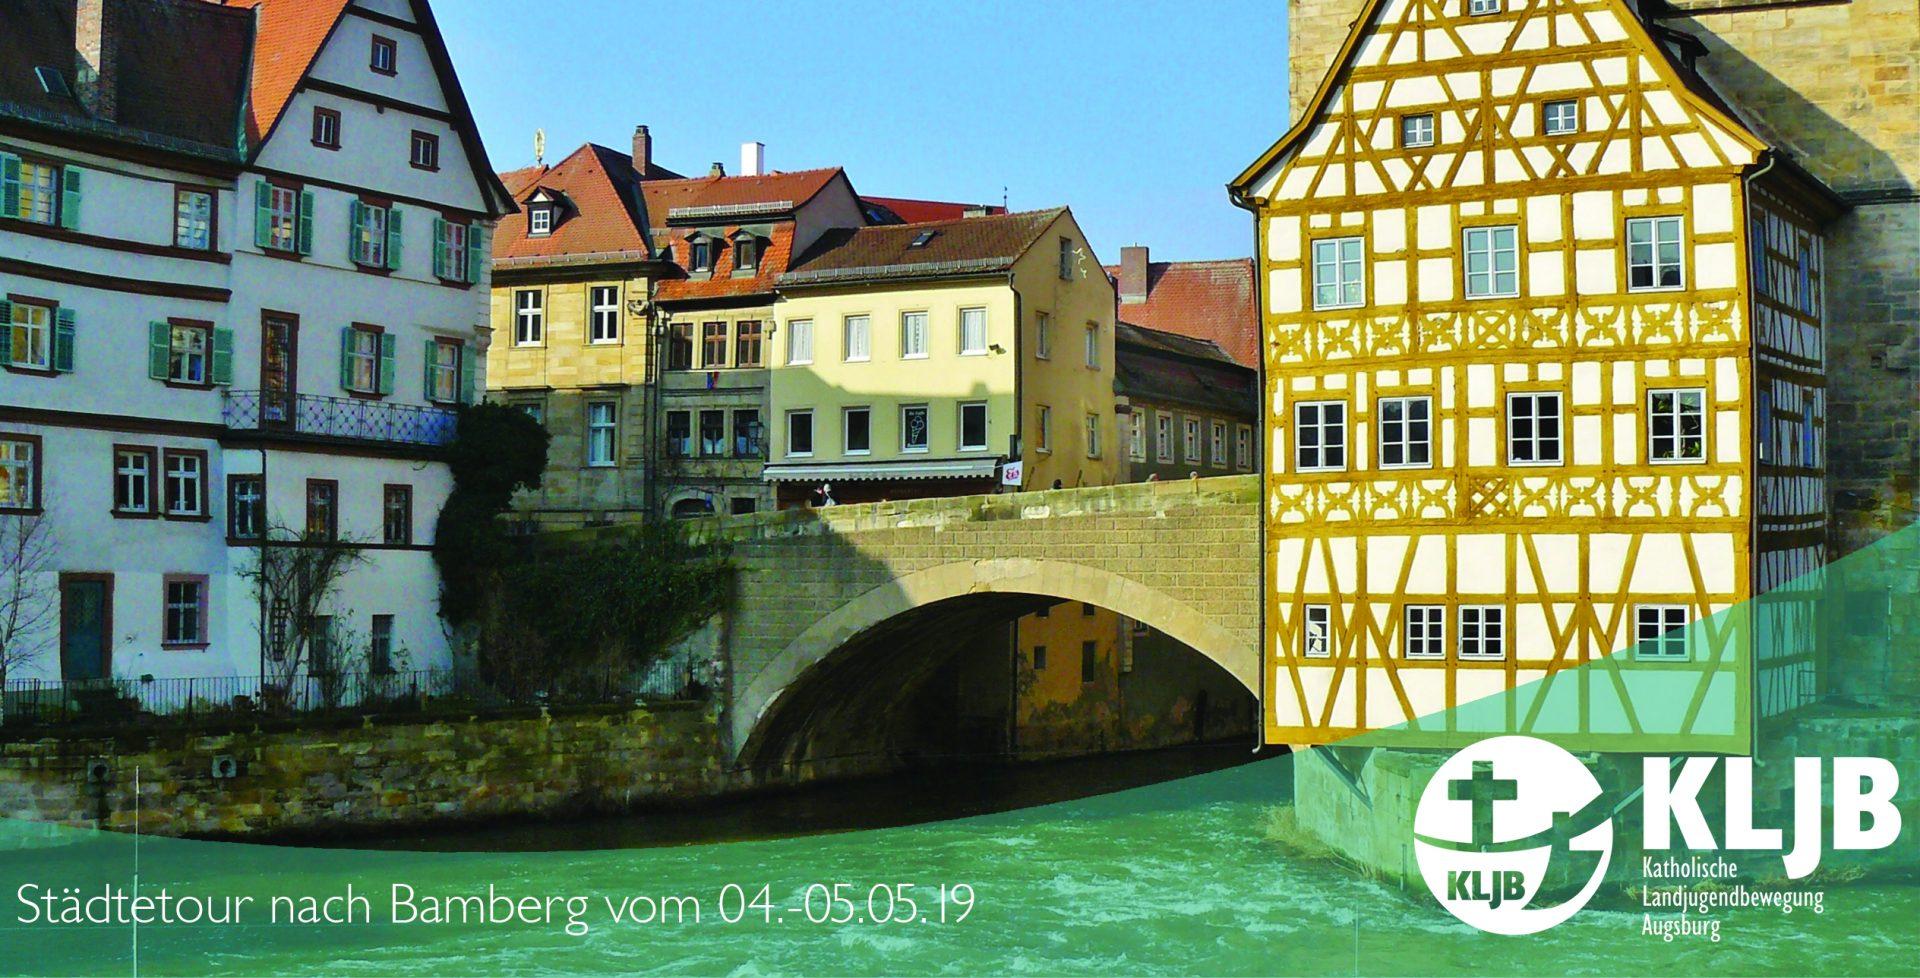 190504 Flyer Städtetour Bamberg